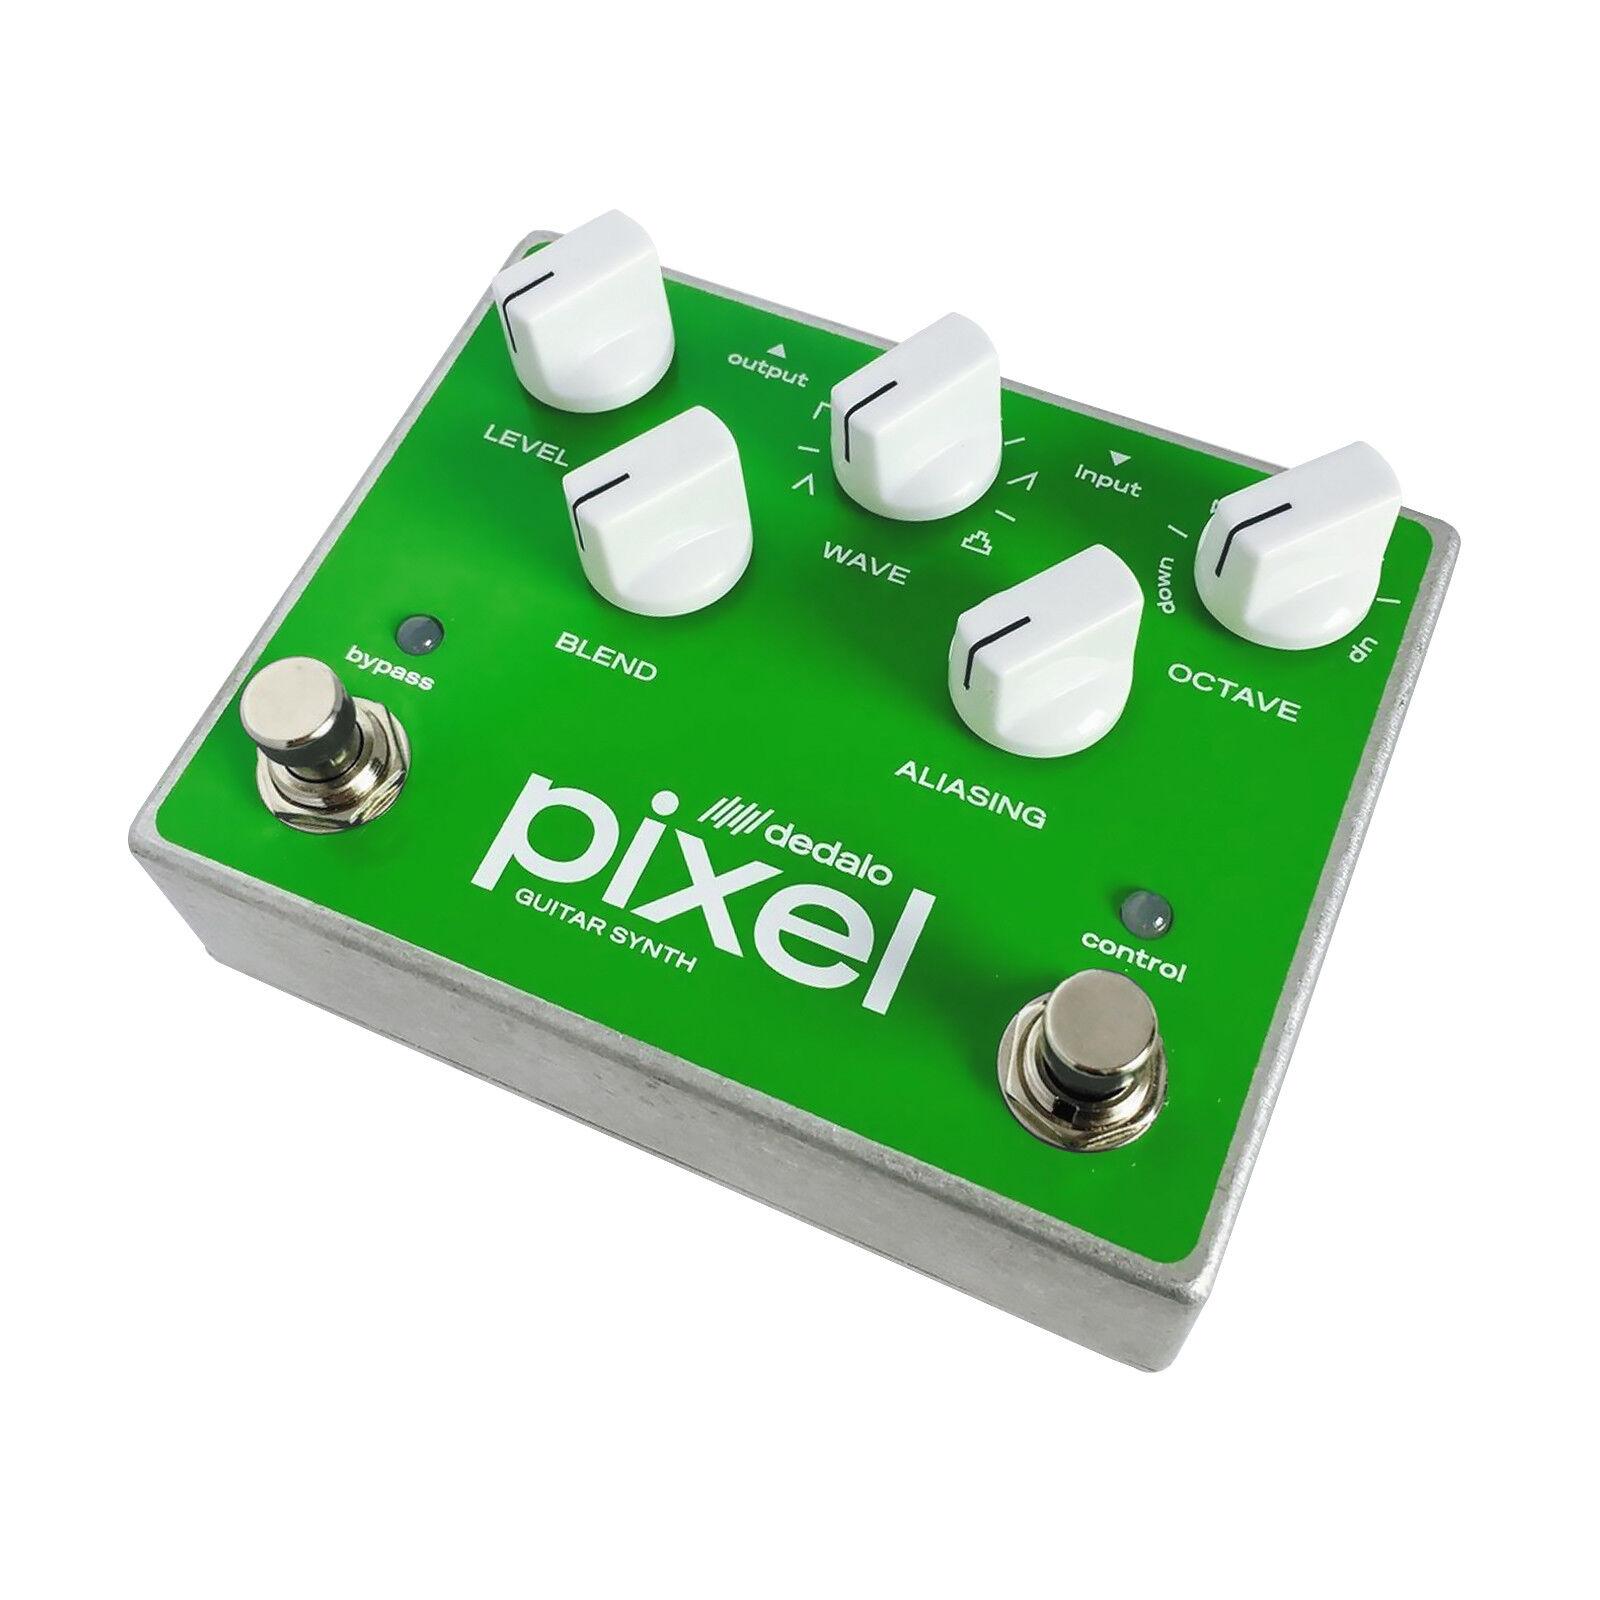 Dedalo FX Pixel Guitar Syntheziser Pedal